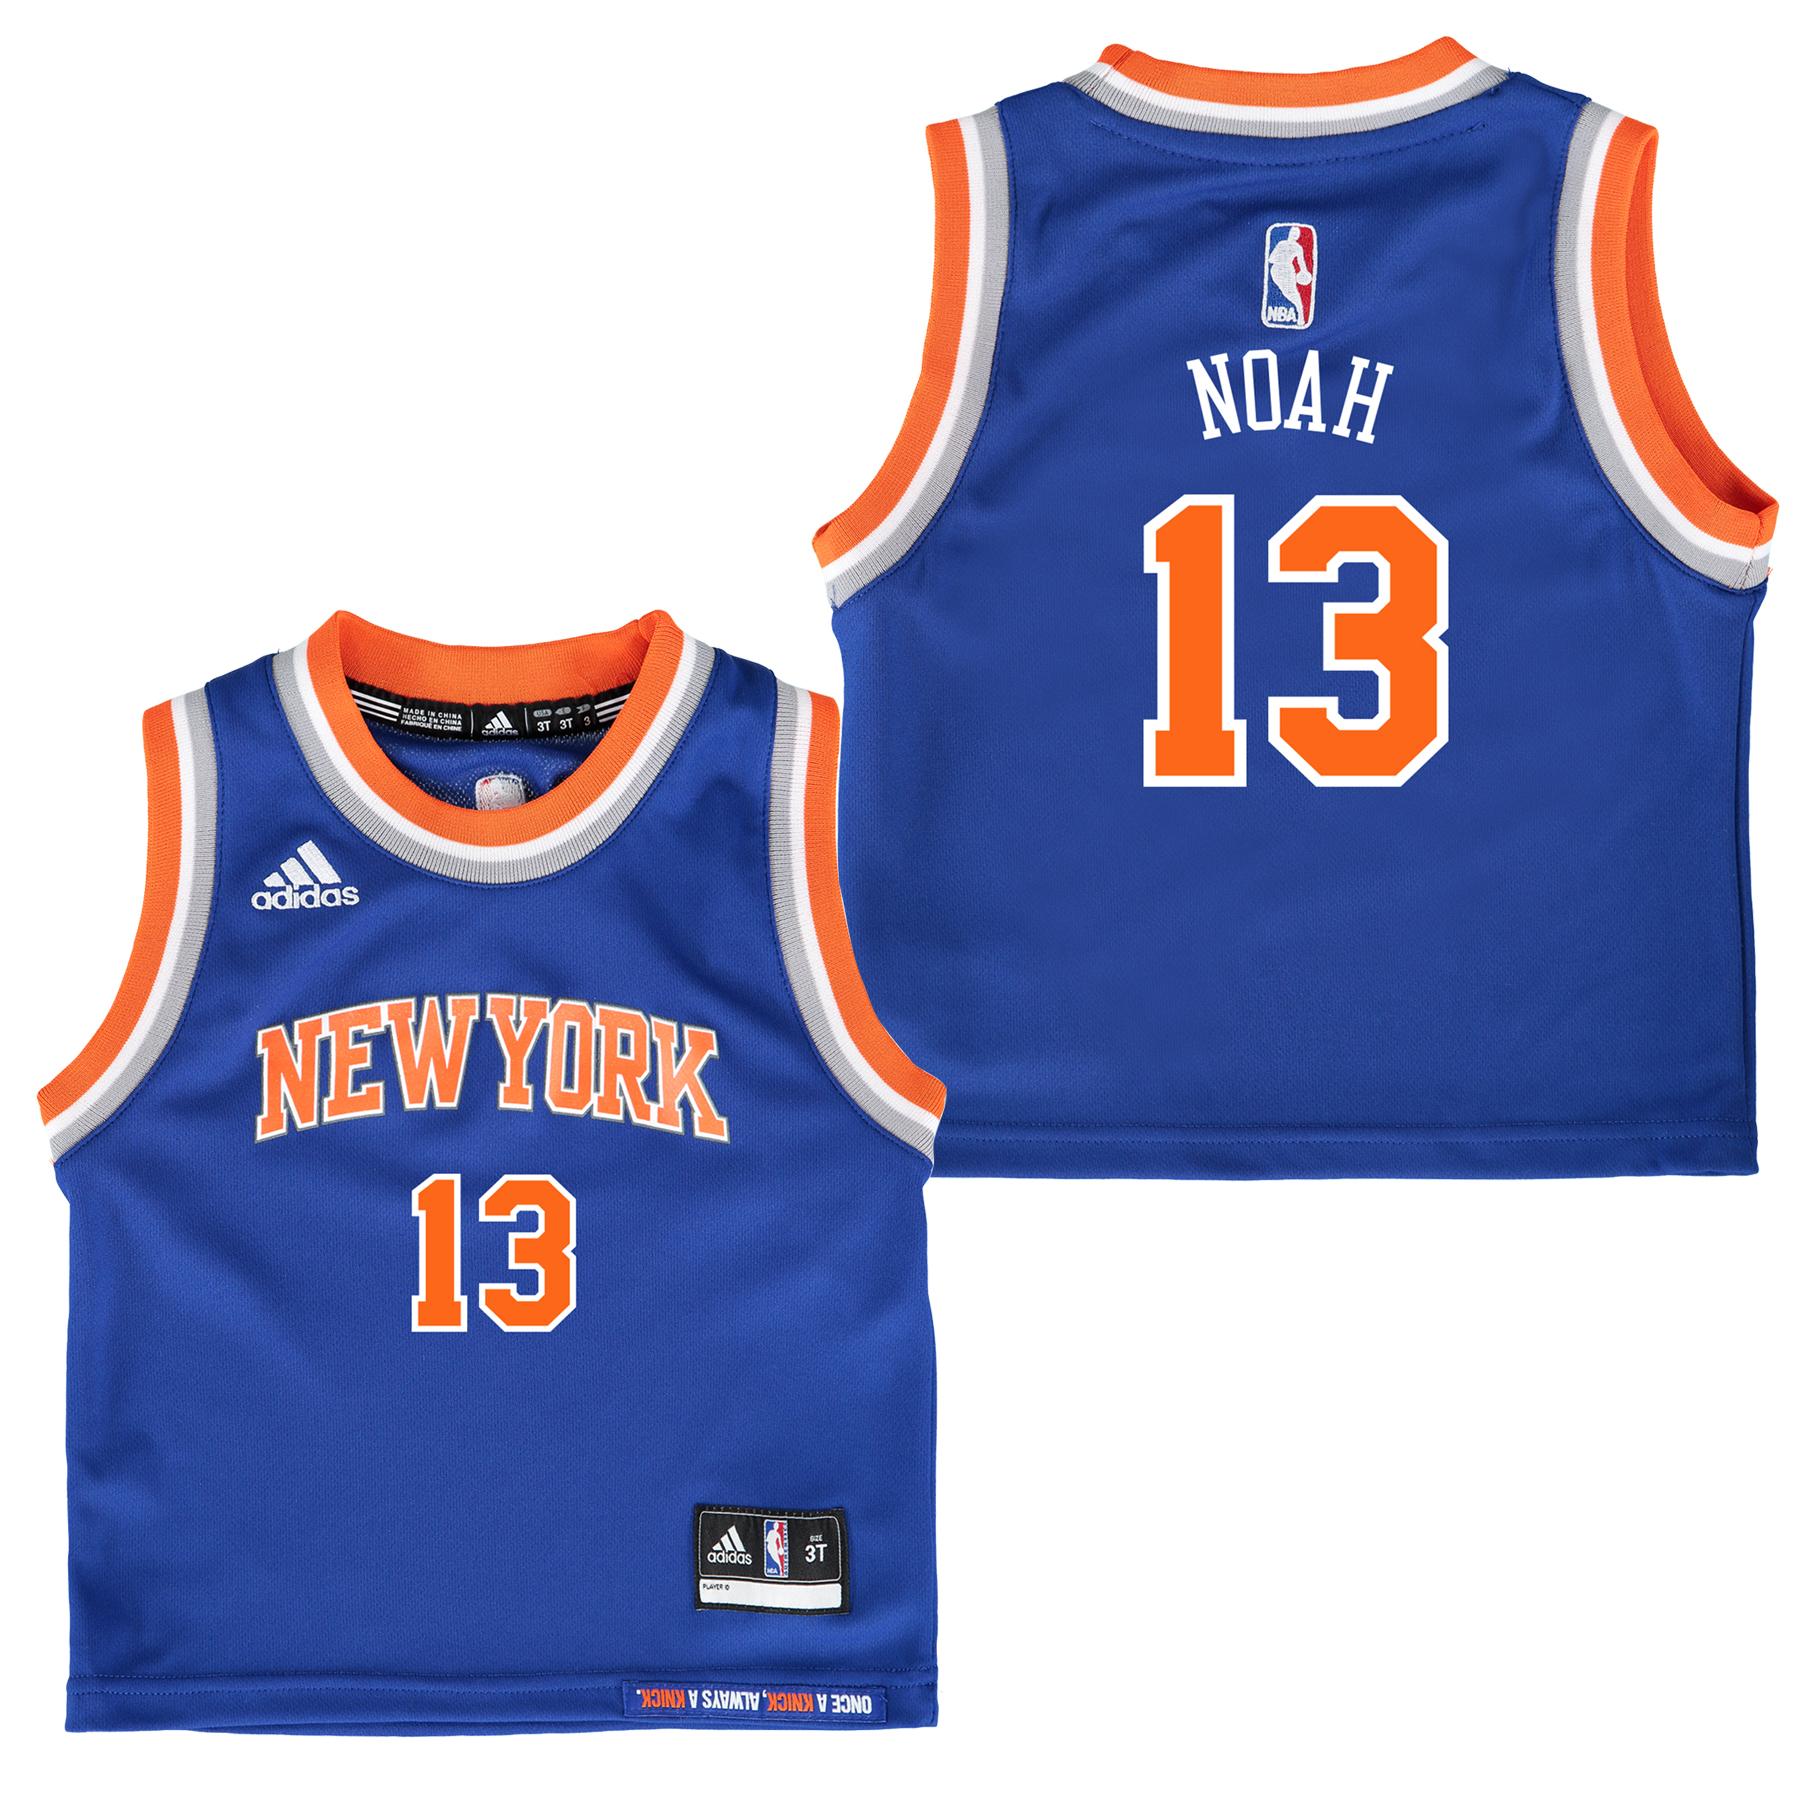 New York Knicks Road Replica Jersey - Joakim Noah - Kids